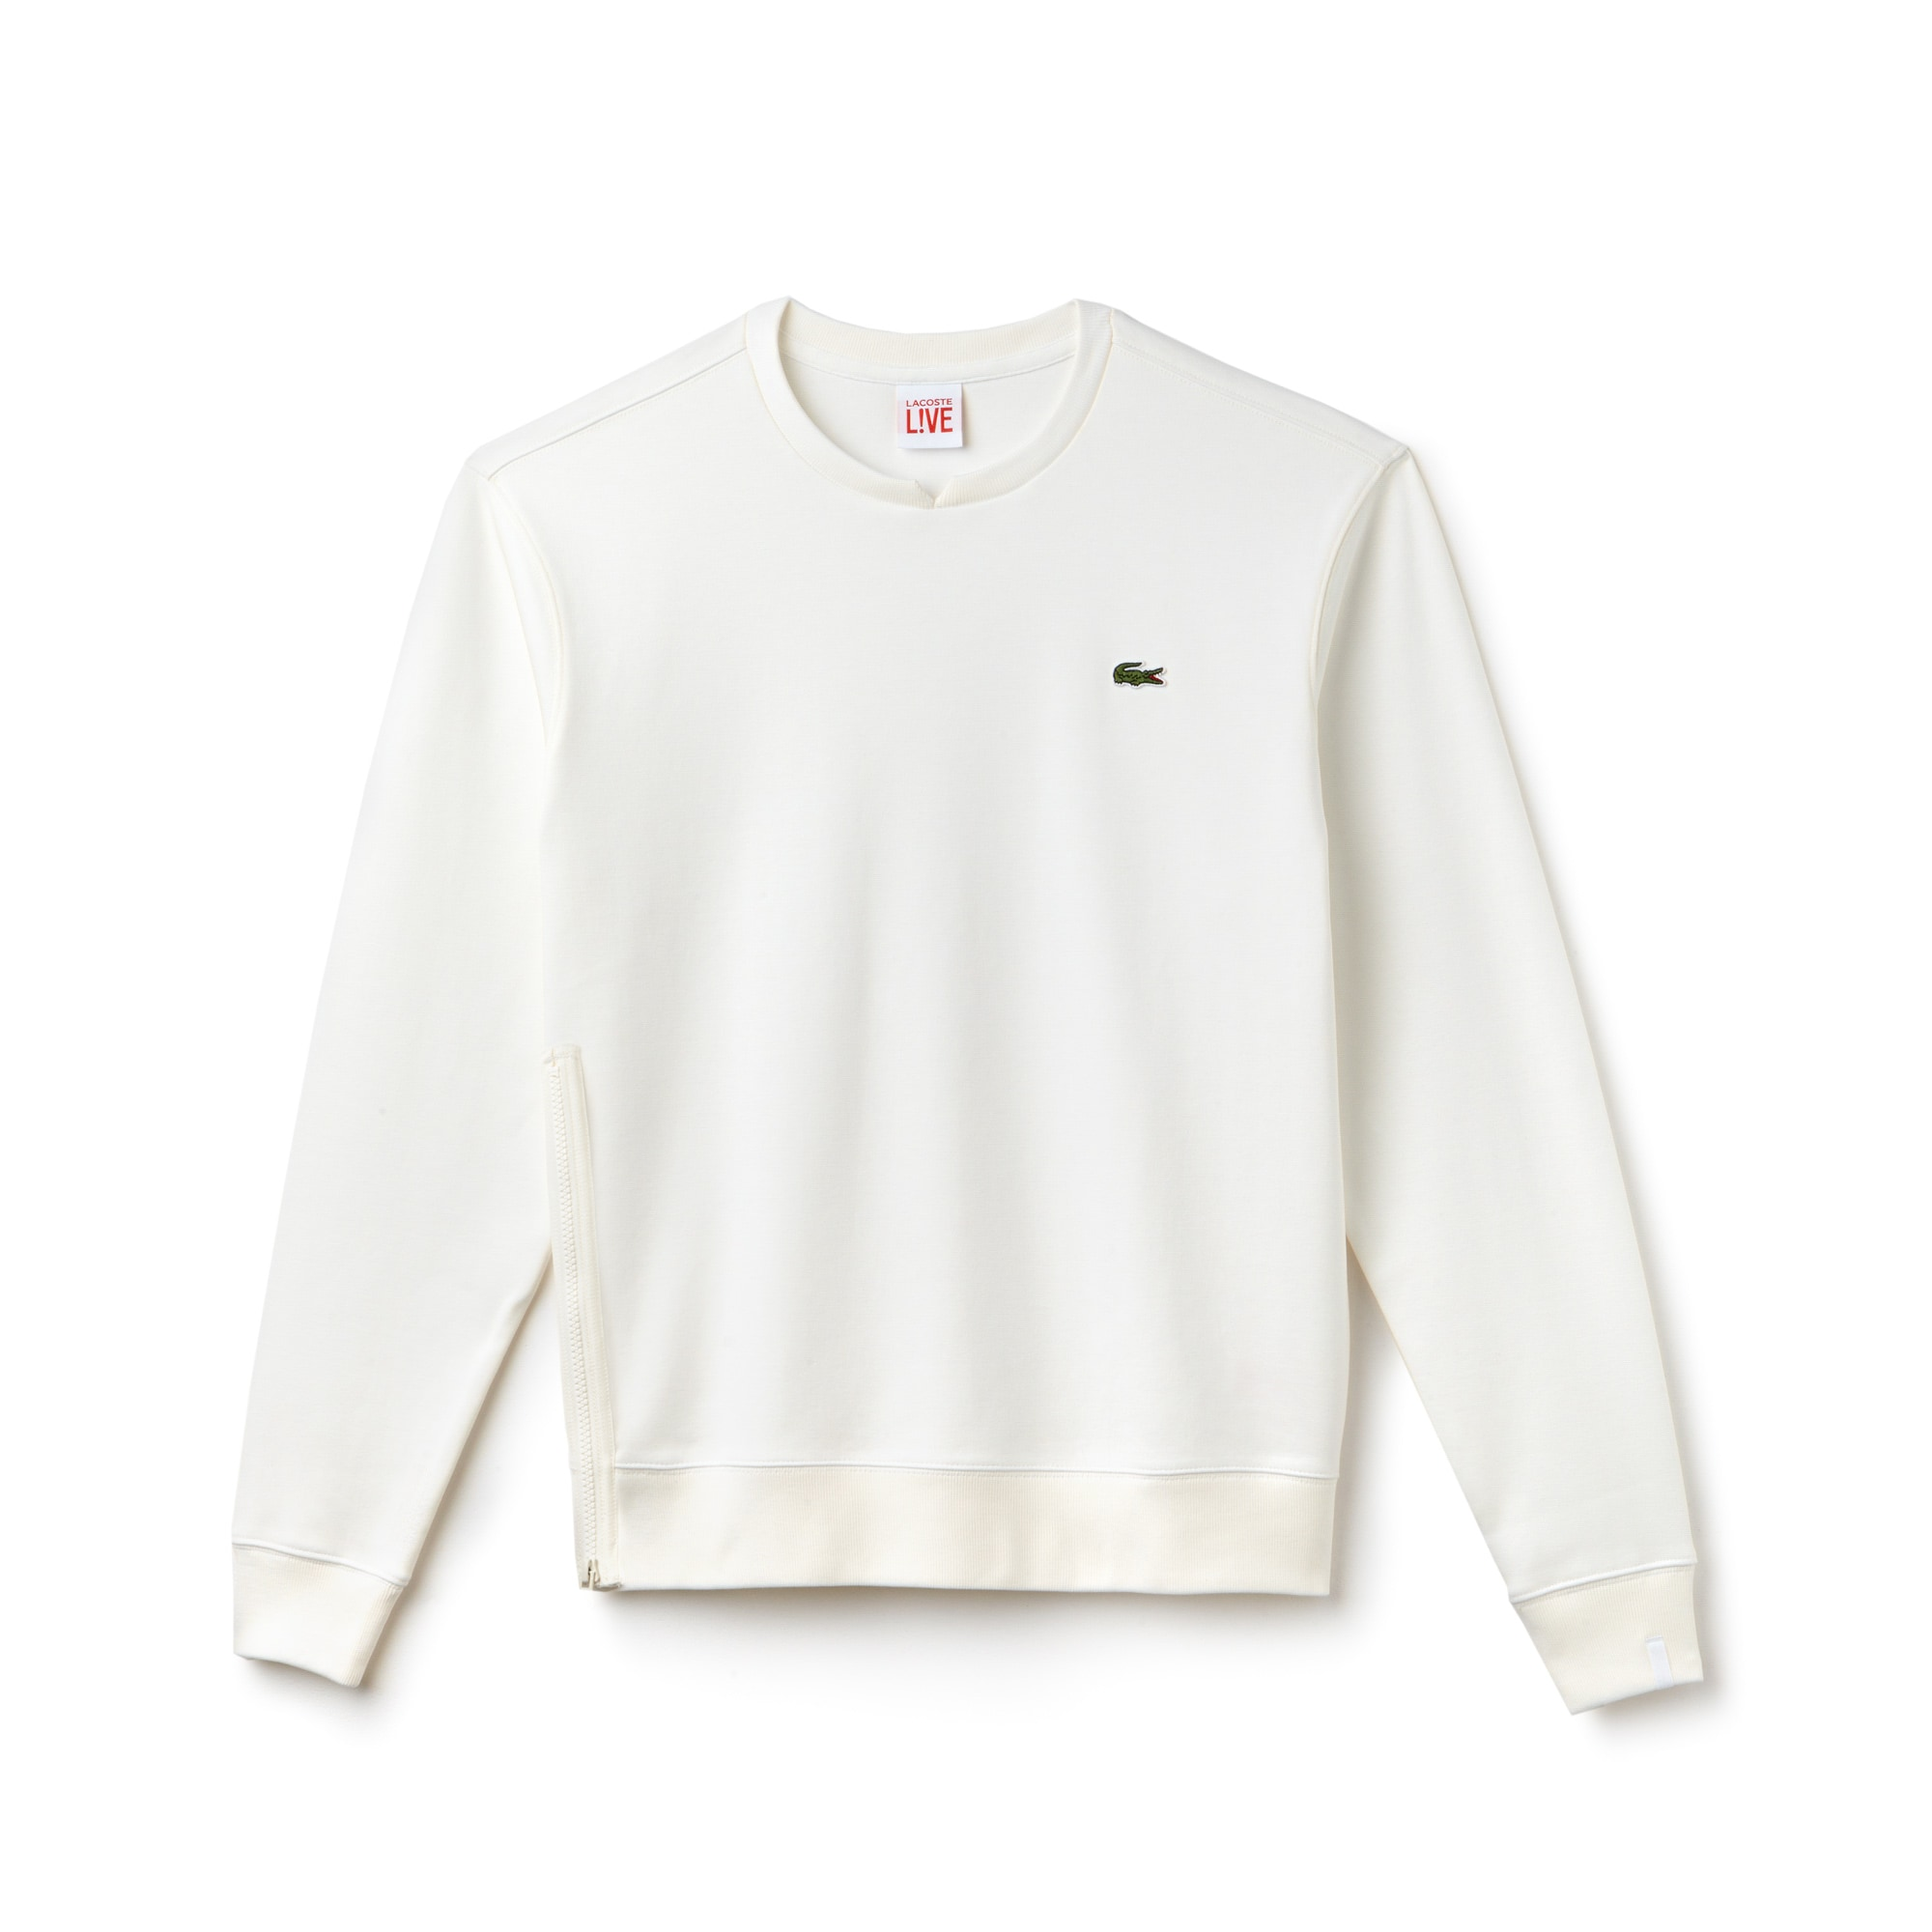 Sweatshirt Lacoste LIVE en interlock avec fermeture zippée